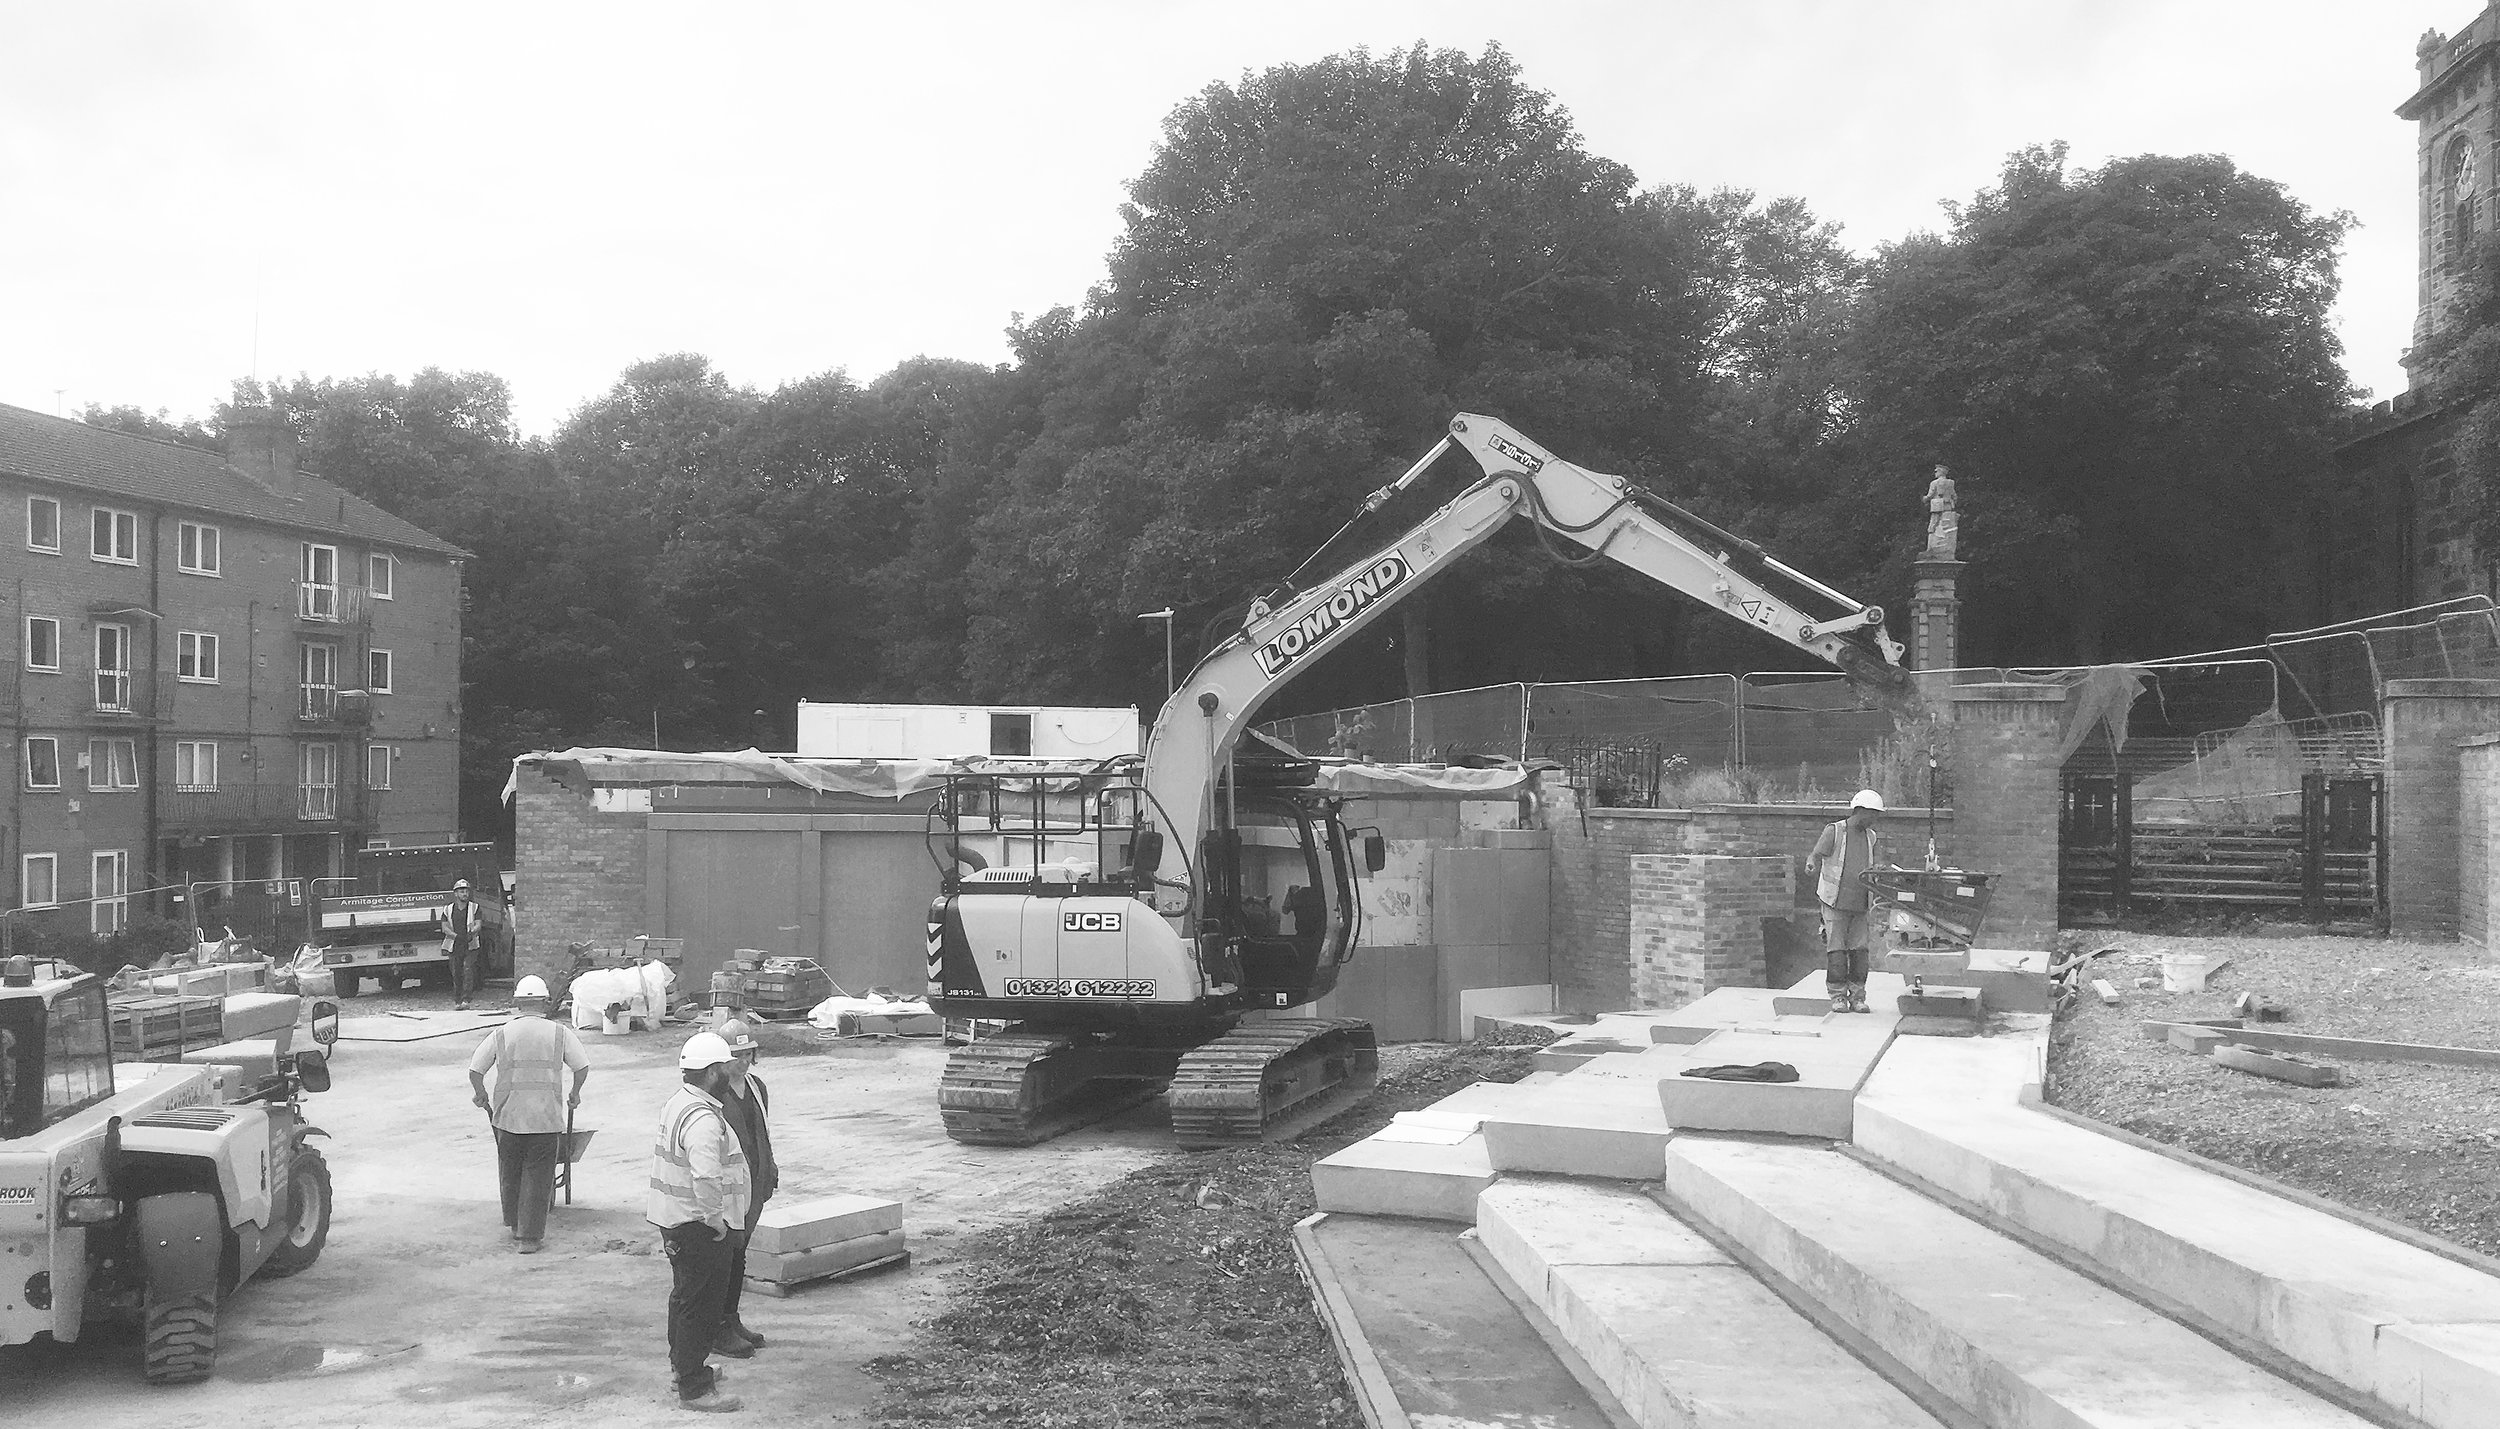 Site progress, August 2019